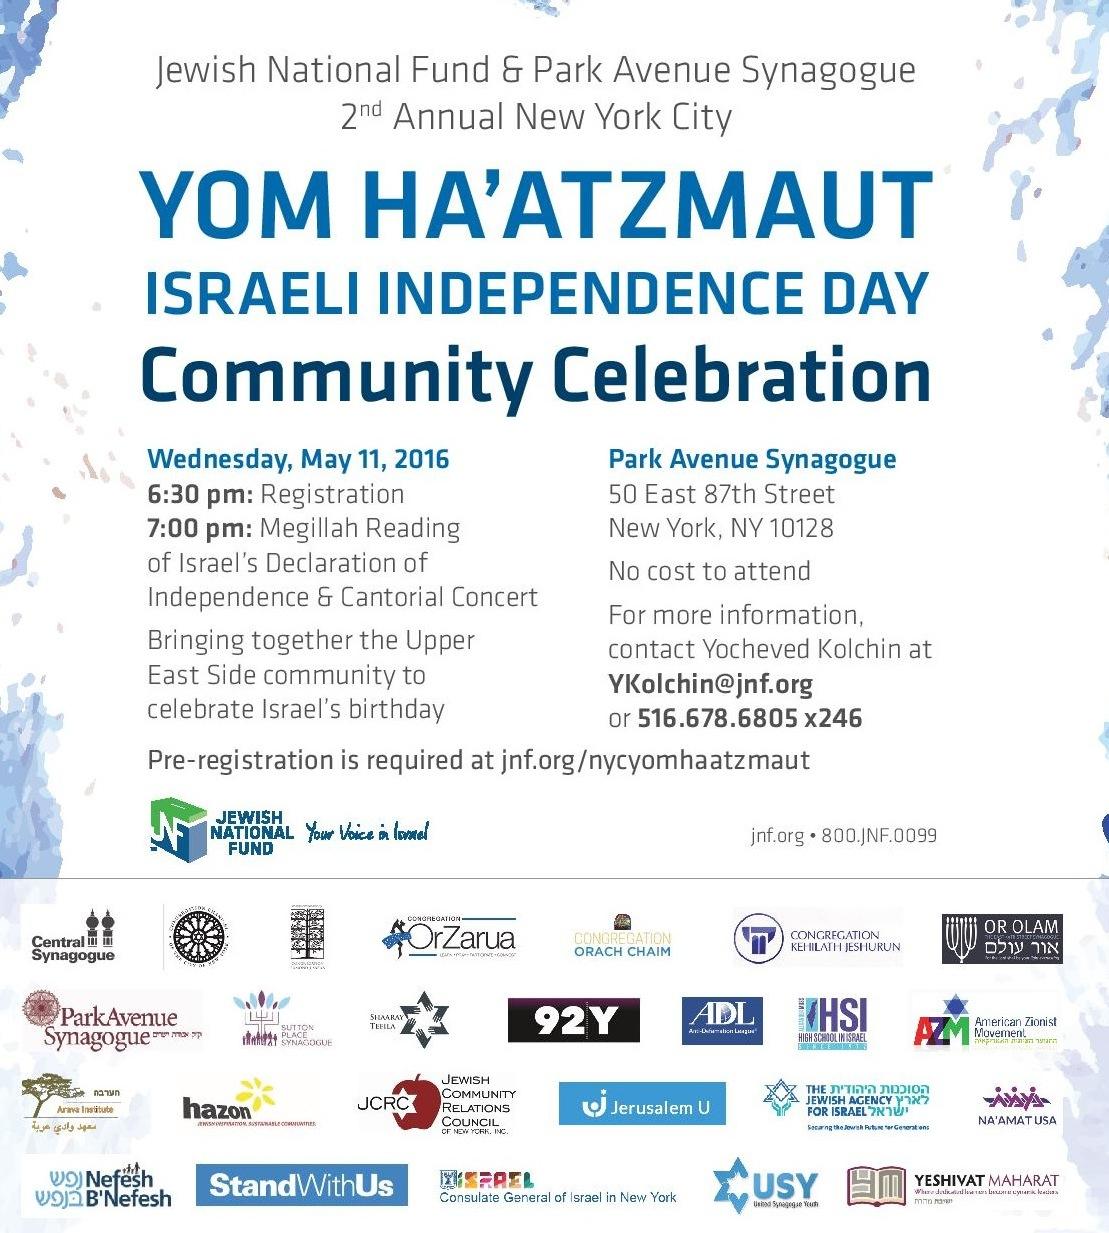 GNY_Yom_Haatzmaut_Flyer-Logos-4.13.16-page-001